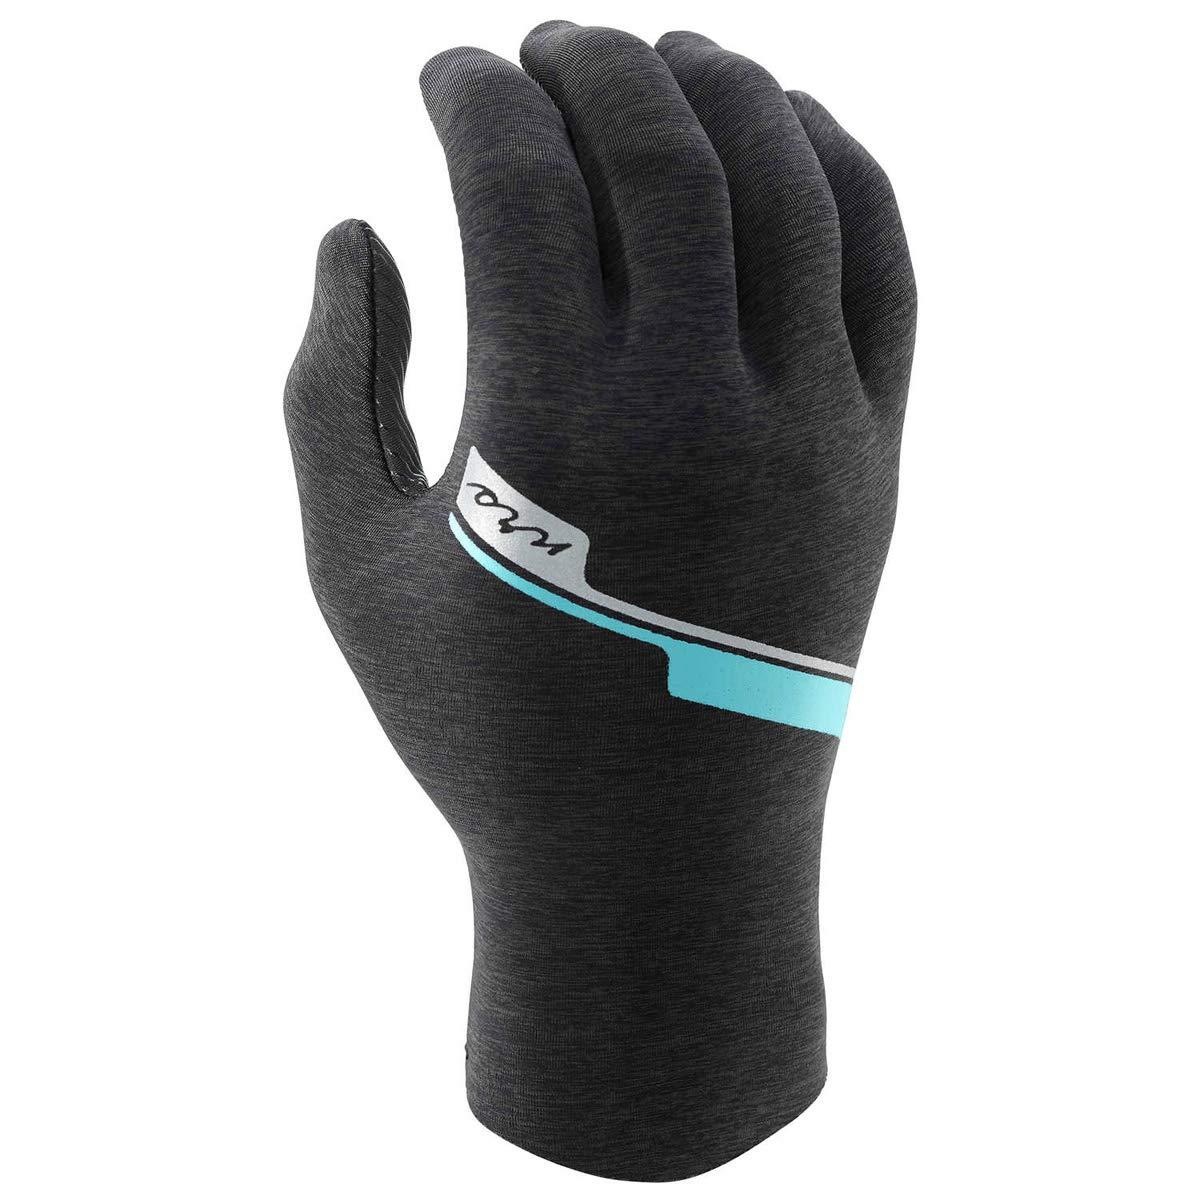 NRS Hydroskin Glove - Women's Grey Heather XL by NRS